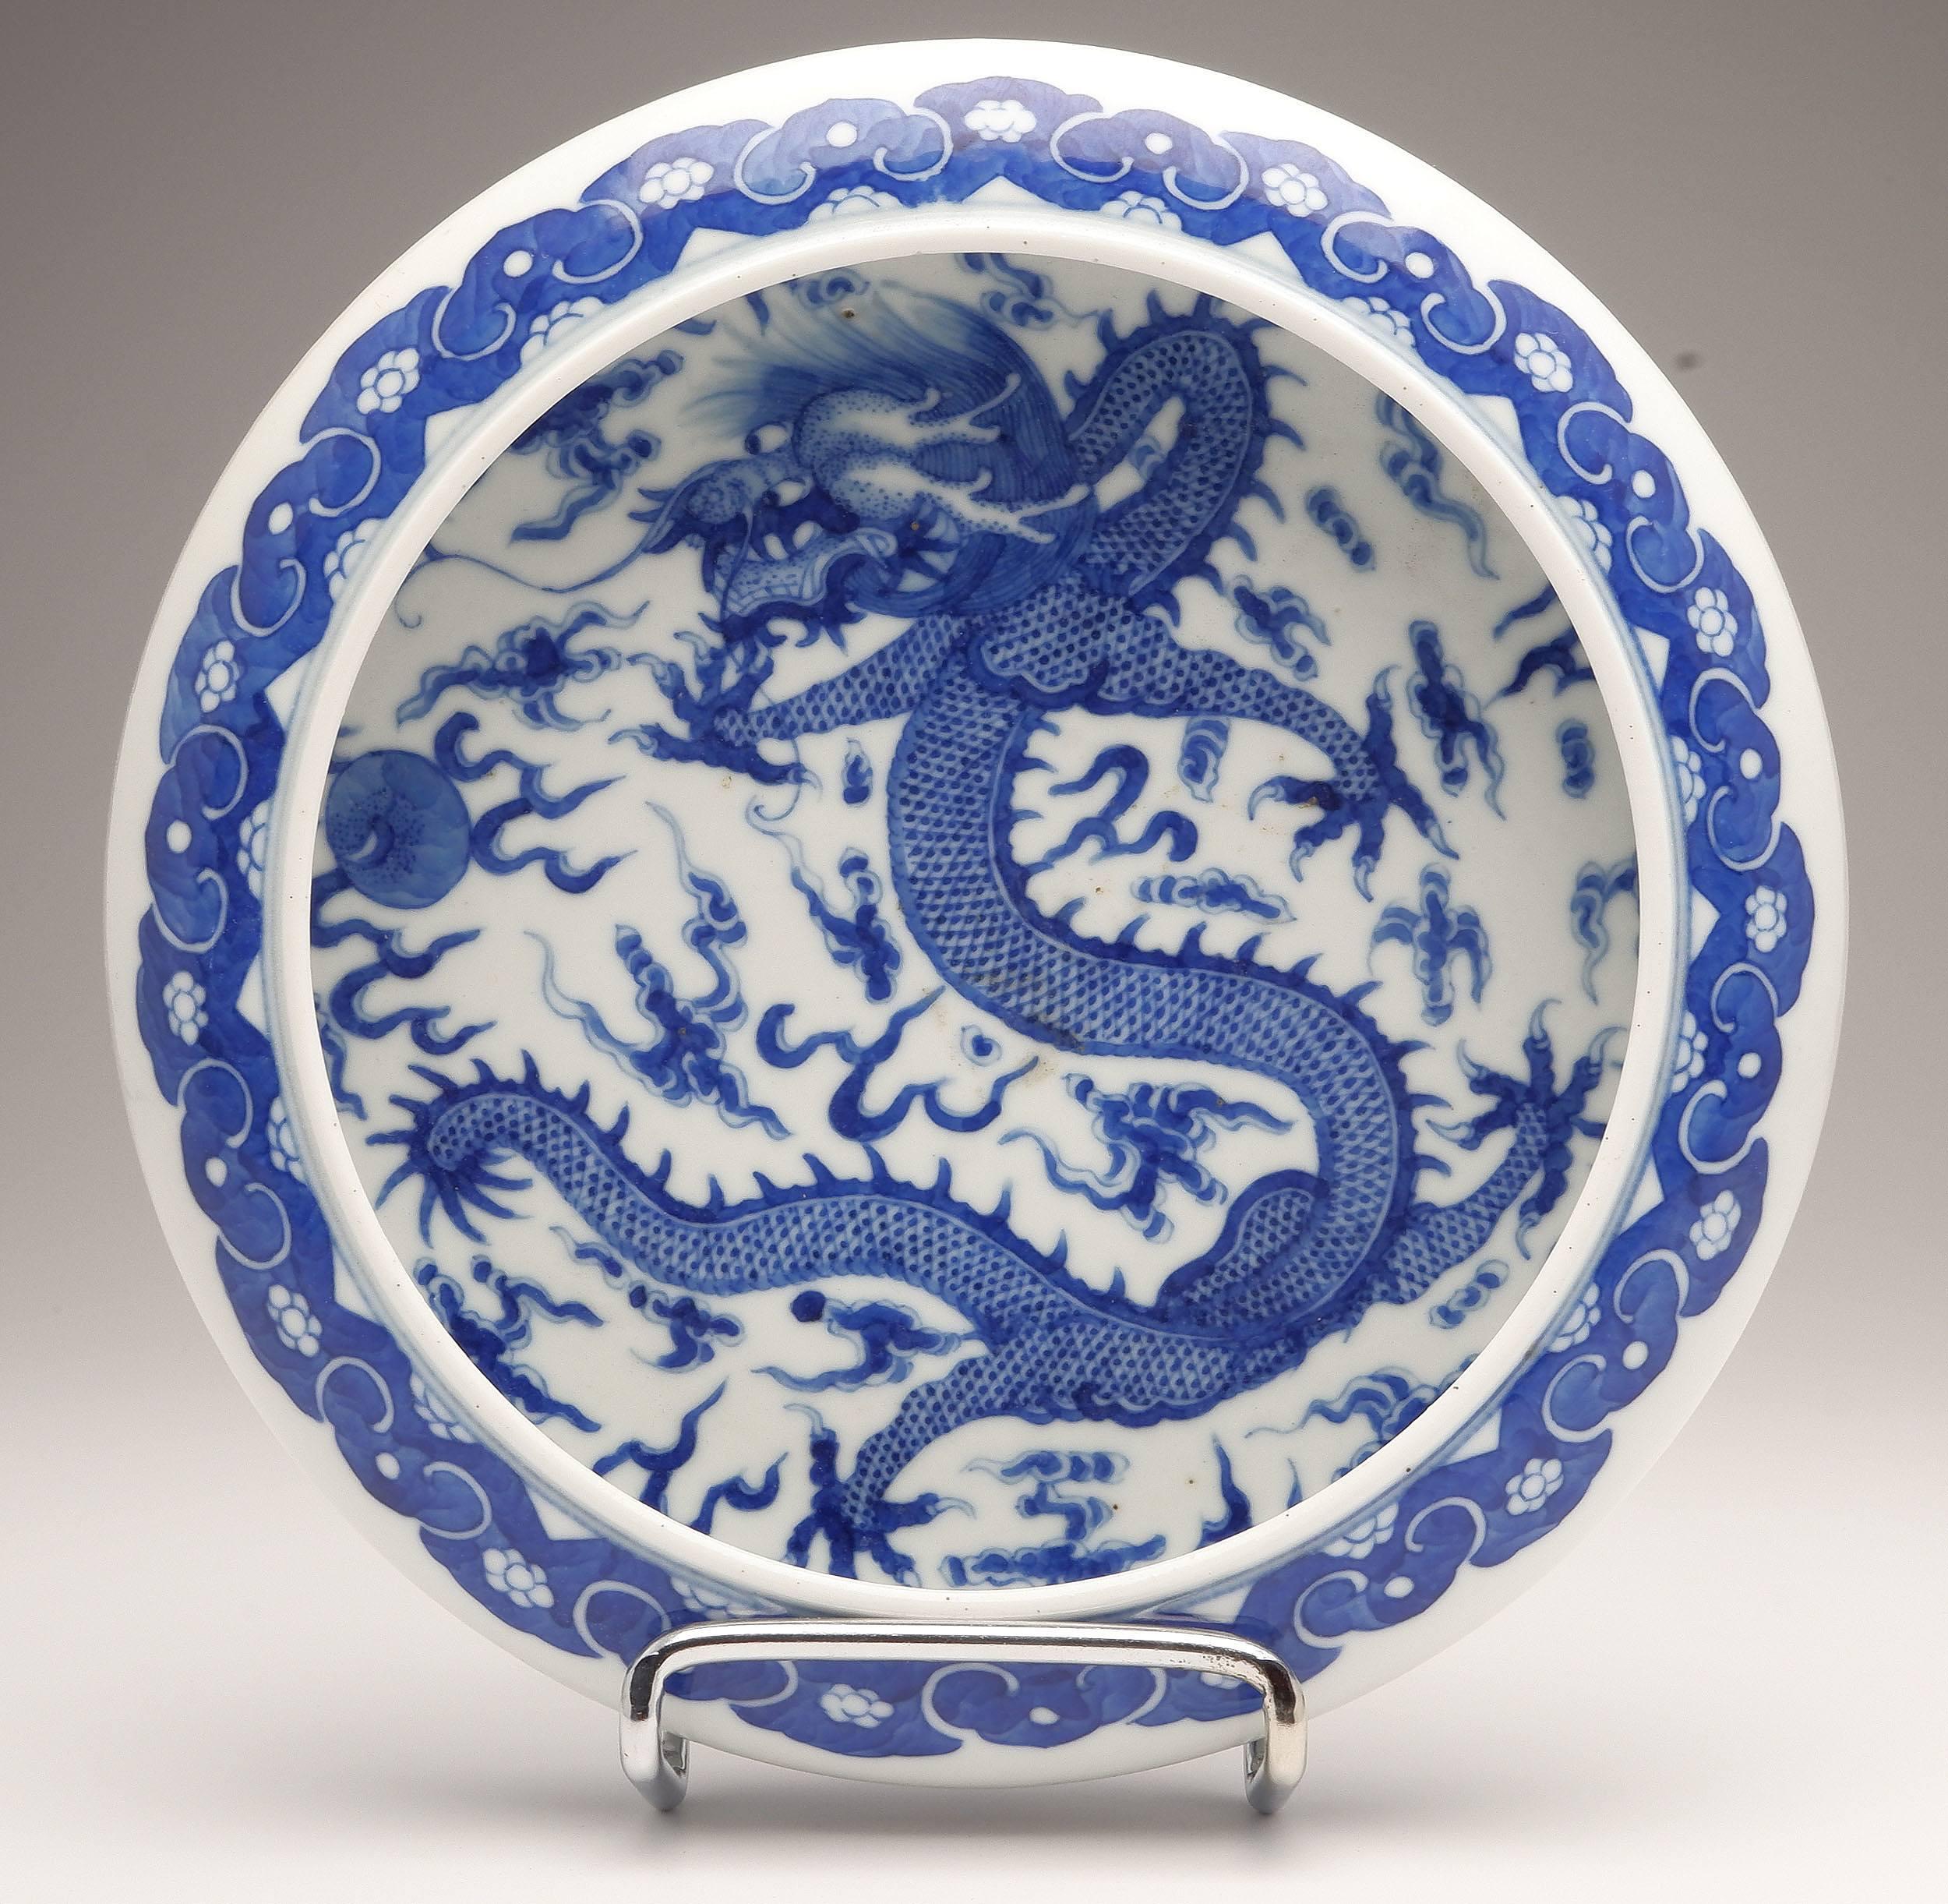 'Chinese Blue and White Dragon Brush Washer, Apocryphal Kangxi Mark, 20th Century'